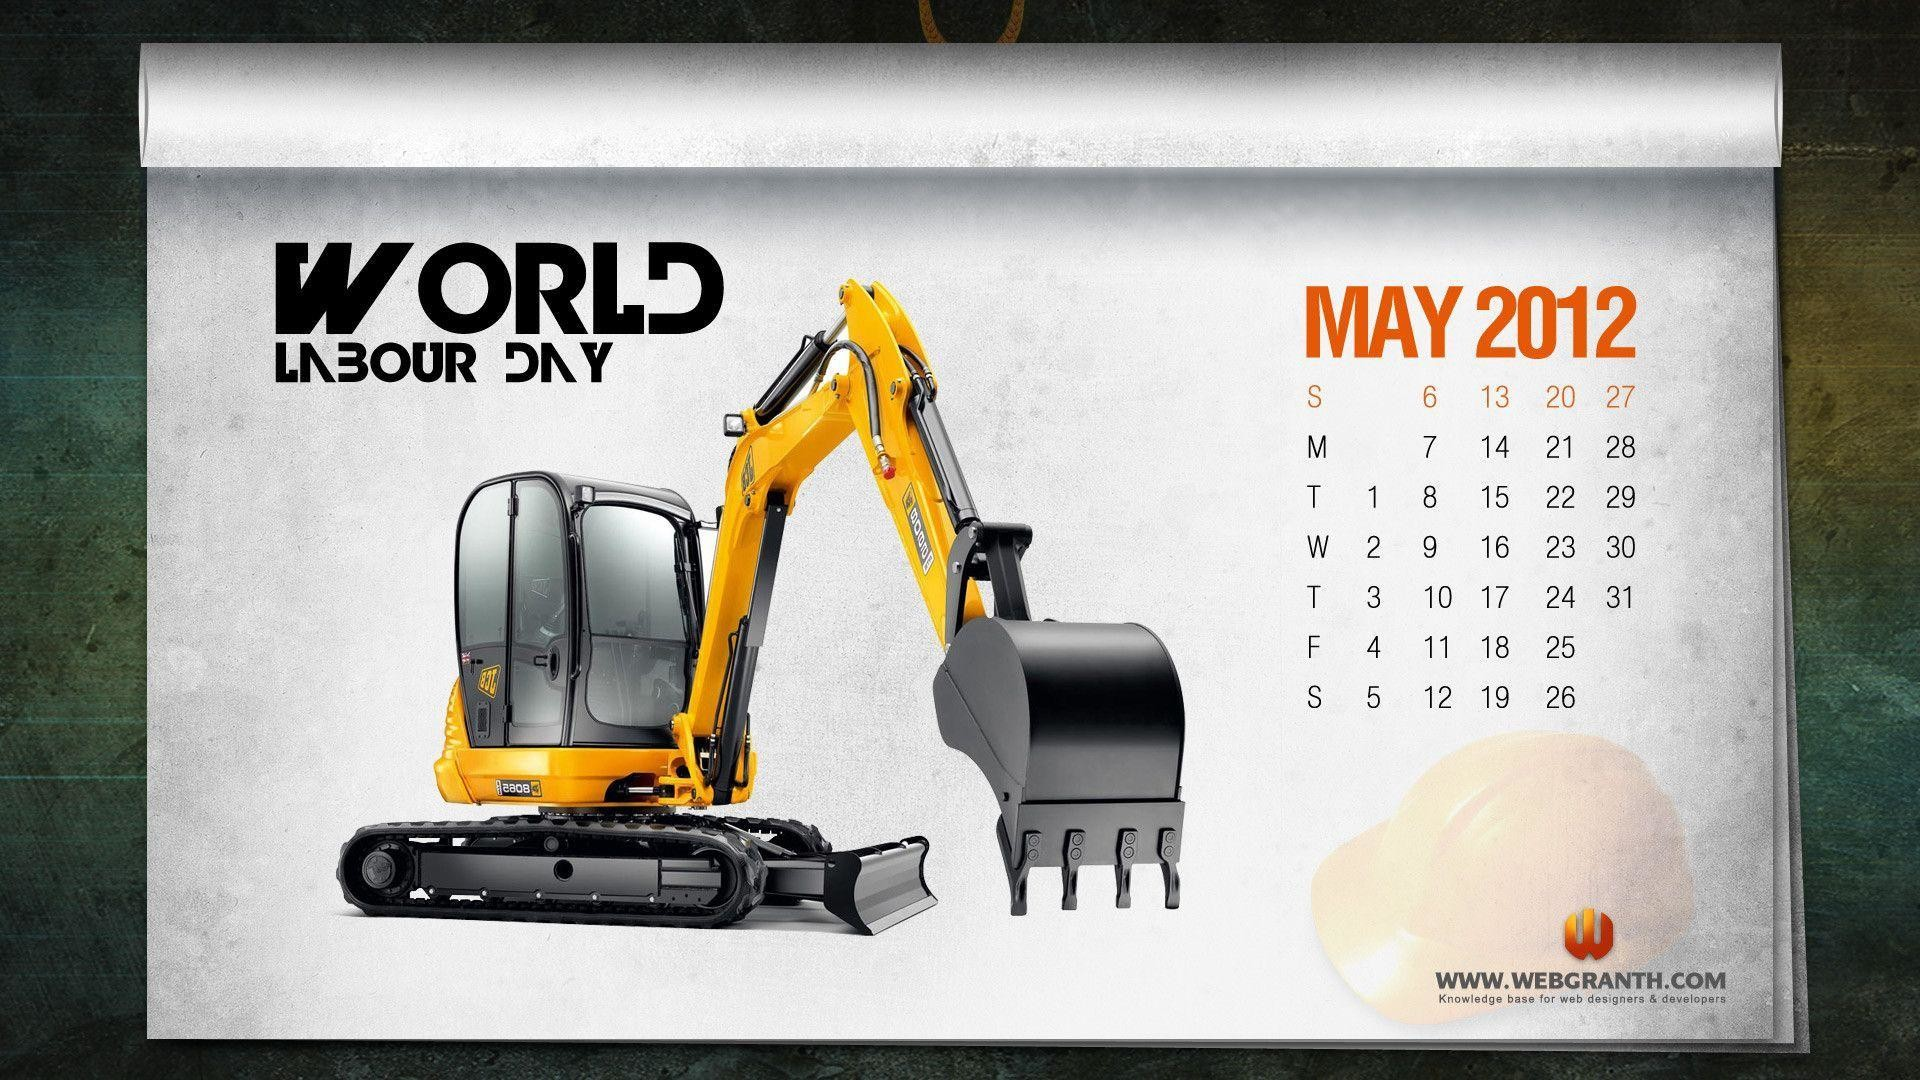 Res: 1920x1080, Download Free World Labor Day Calendar Wallpaper – Webgranth 2014